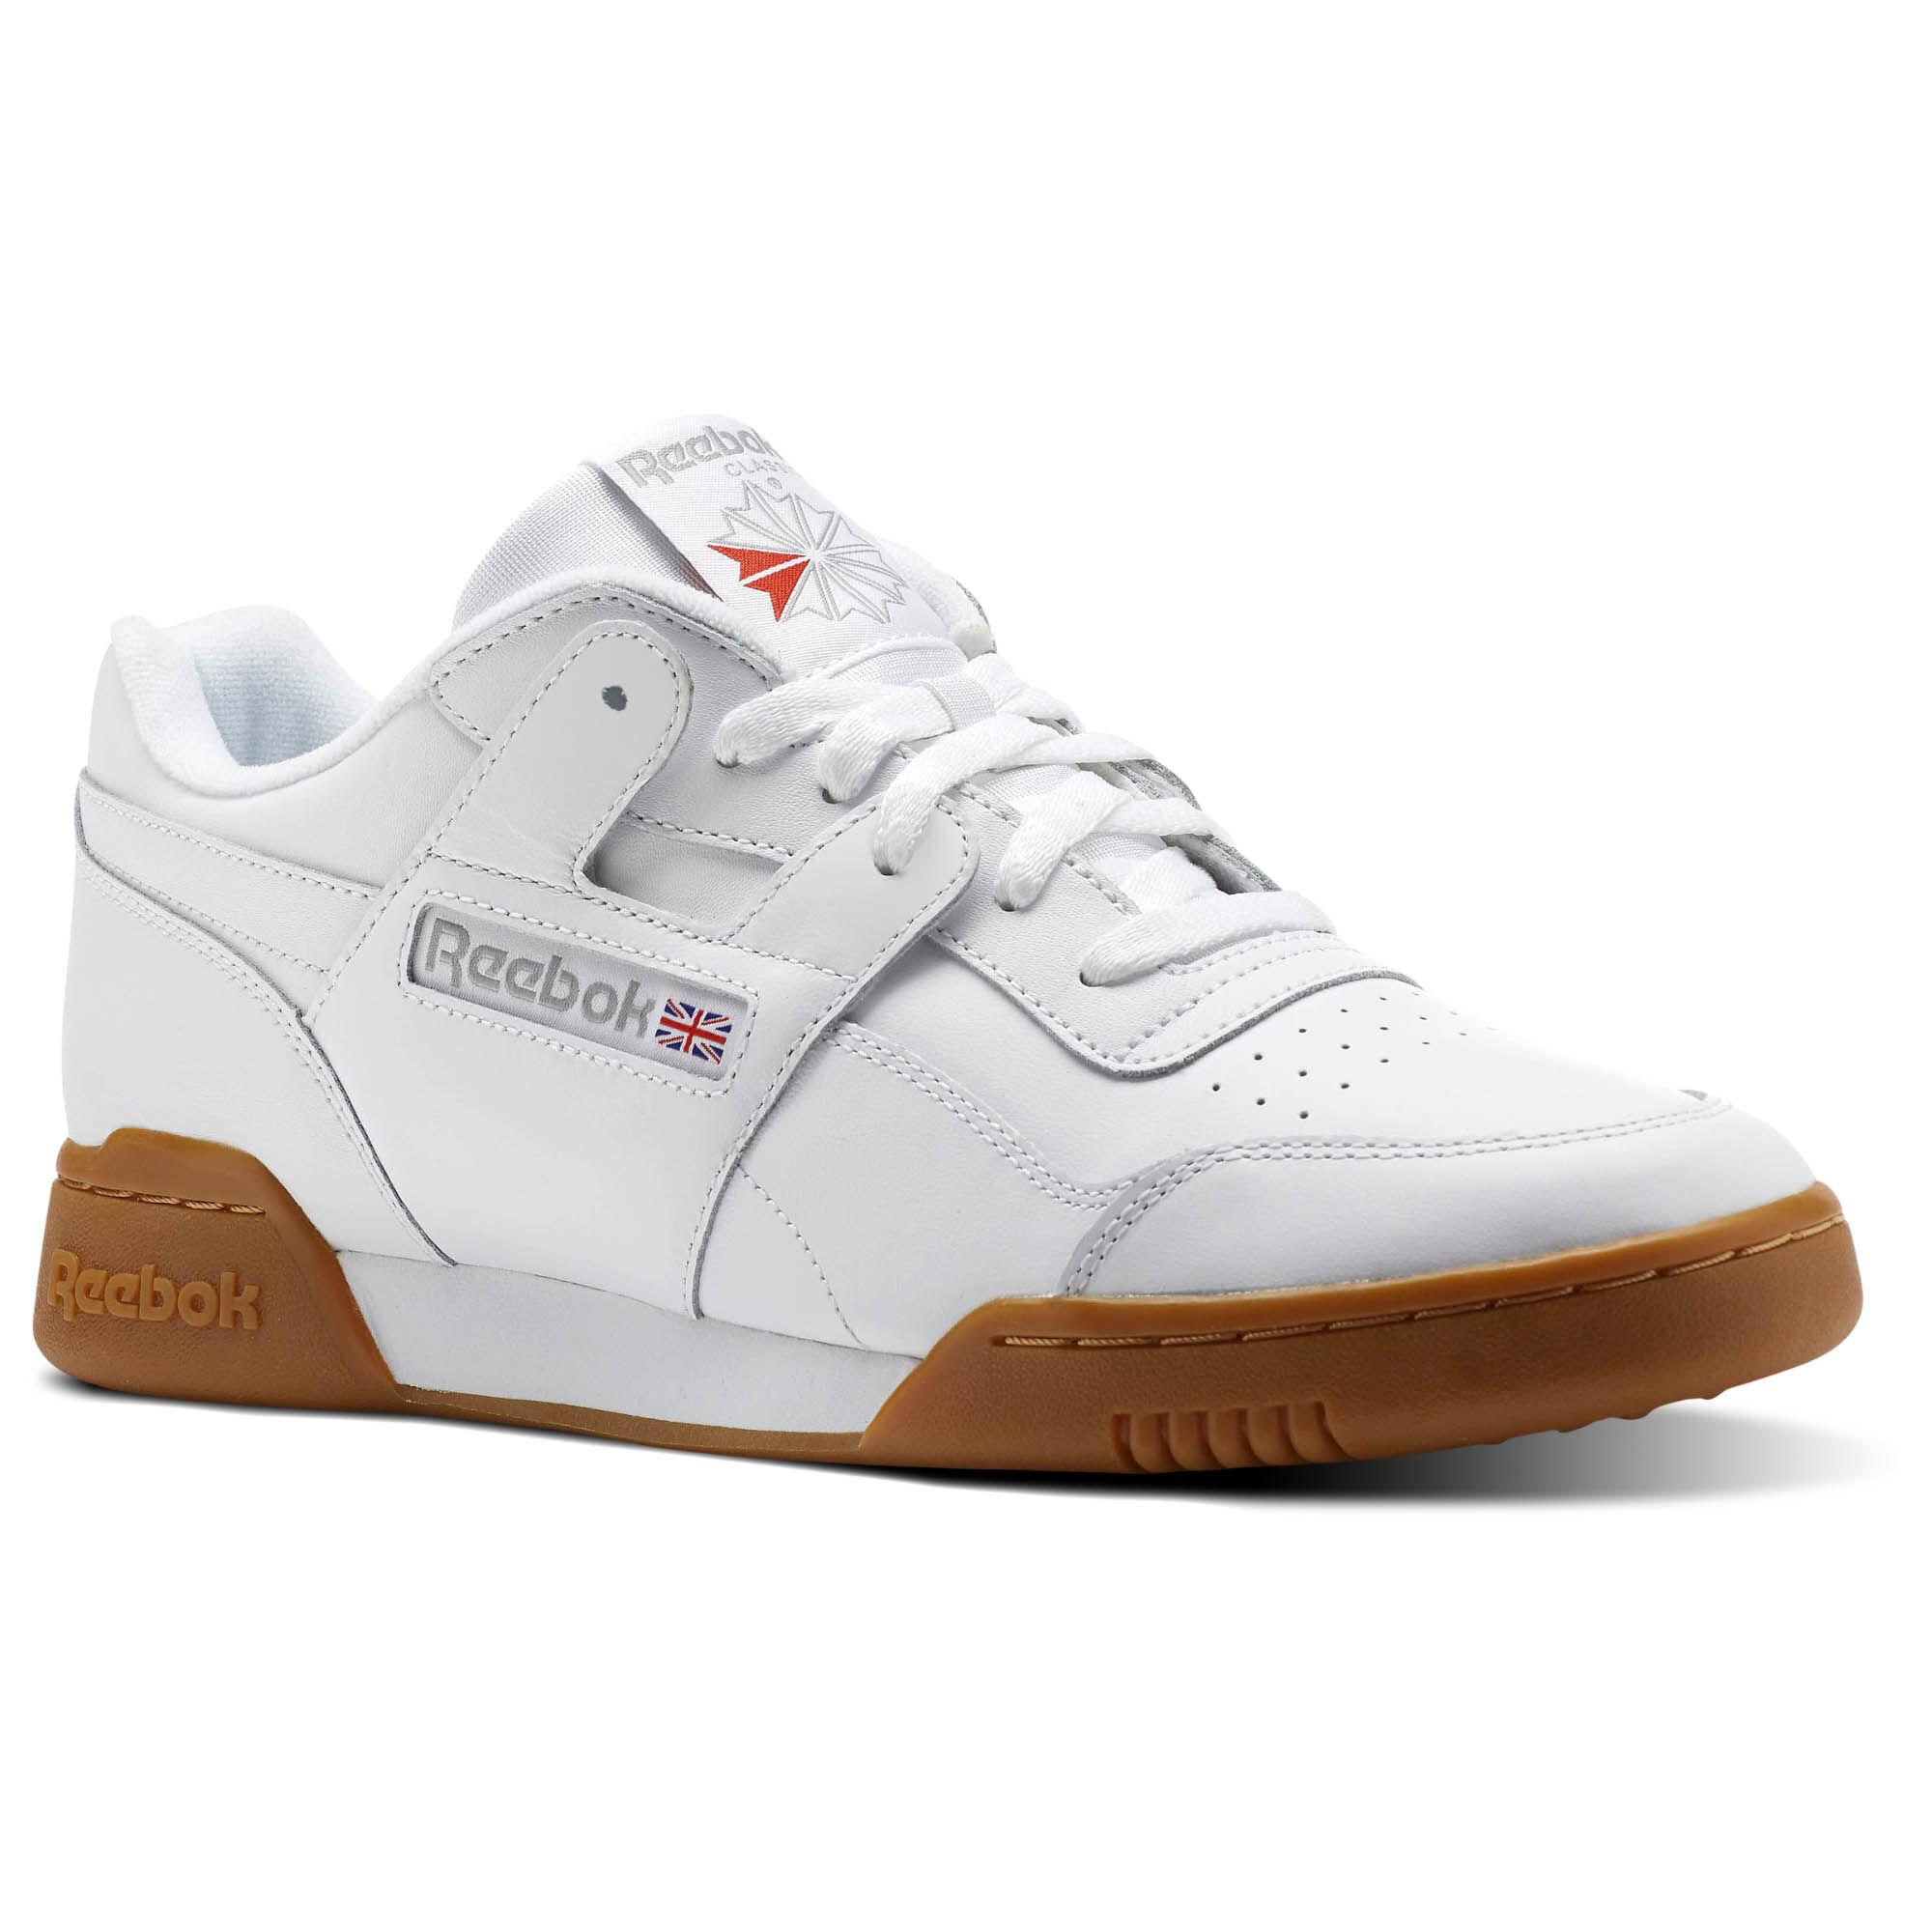 Reebok - Workout Plus White/Carbon/Classic Red/Reebok Royal-Gum CN2126